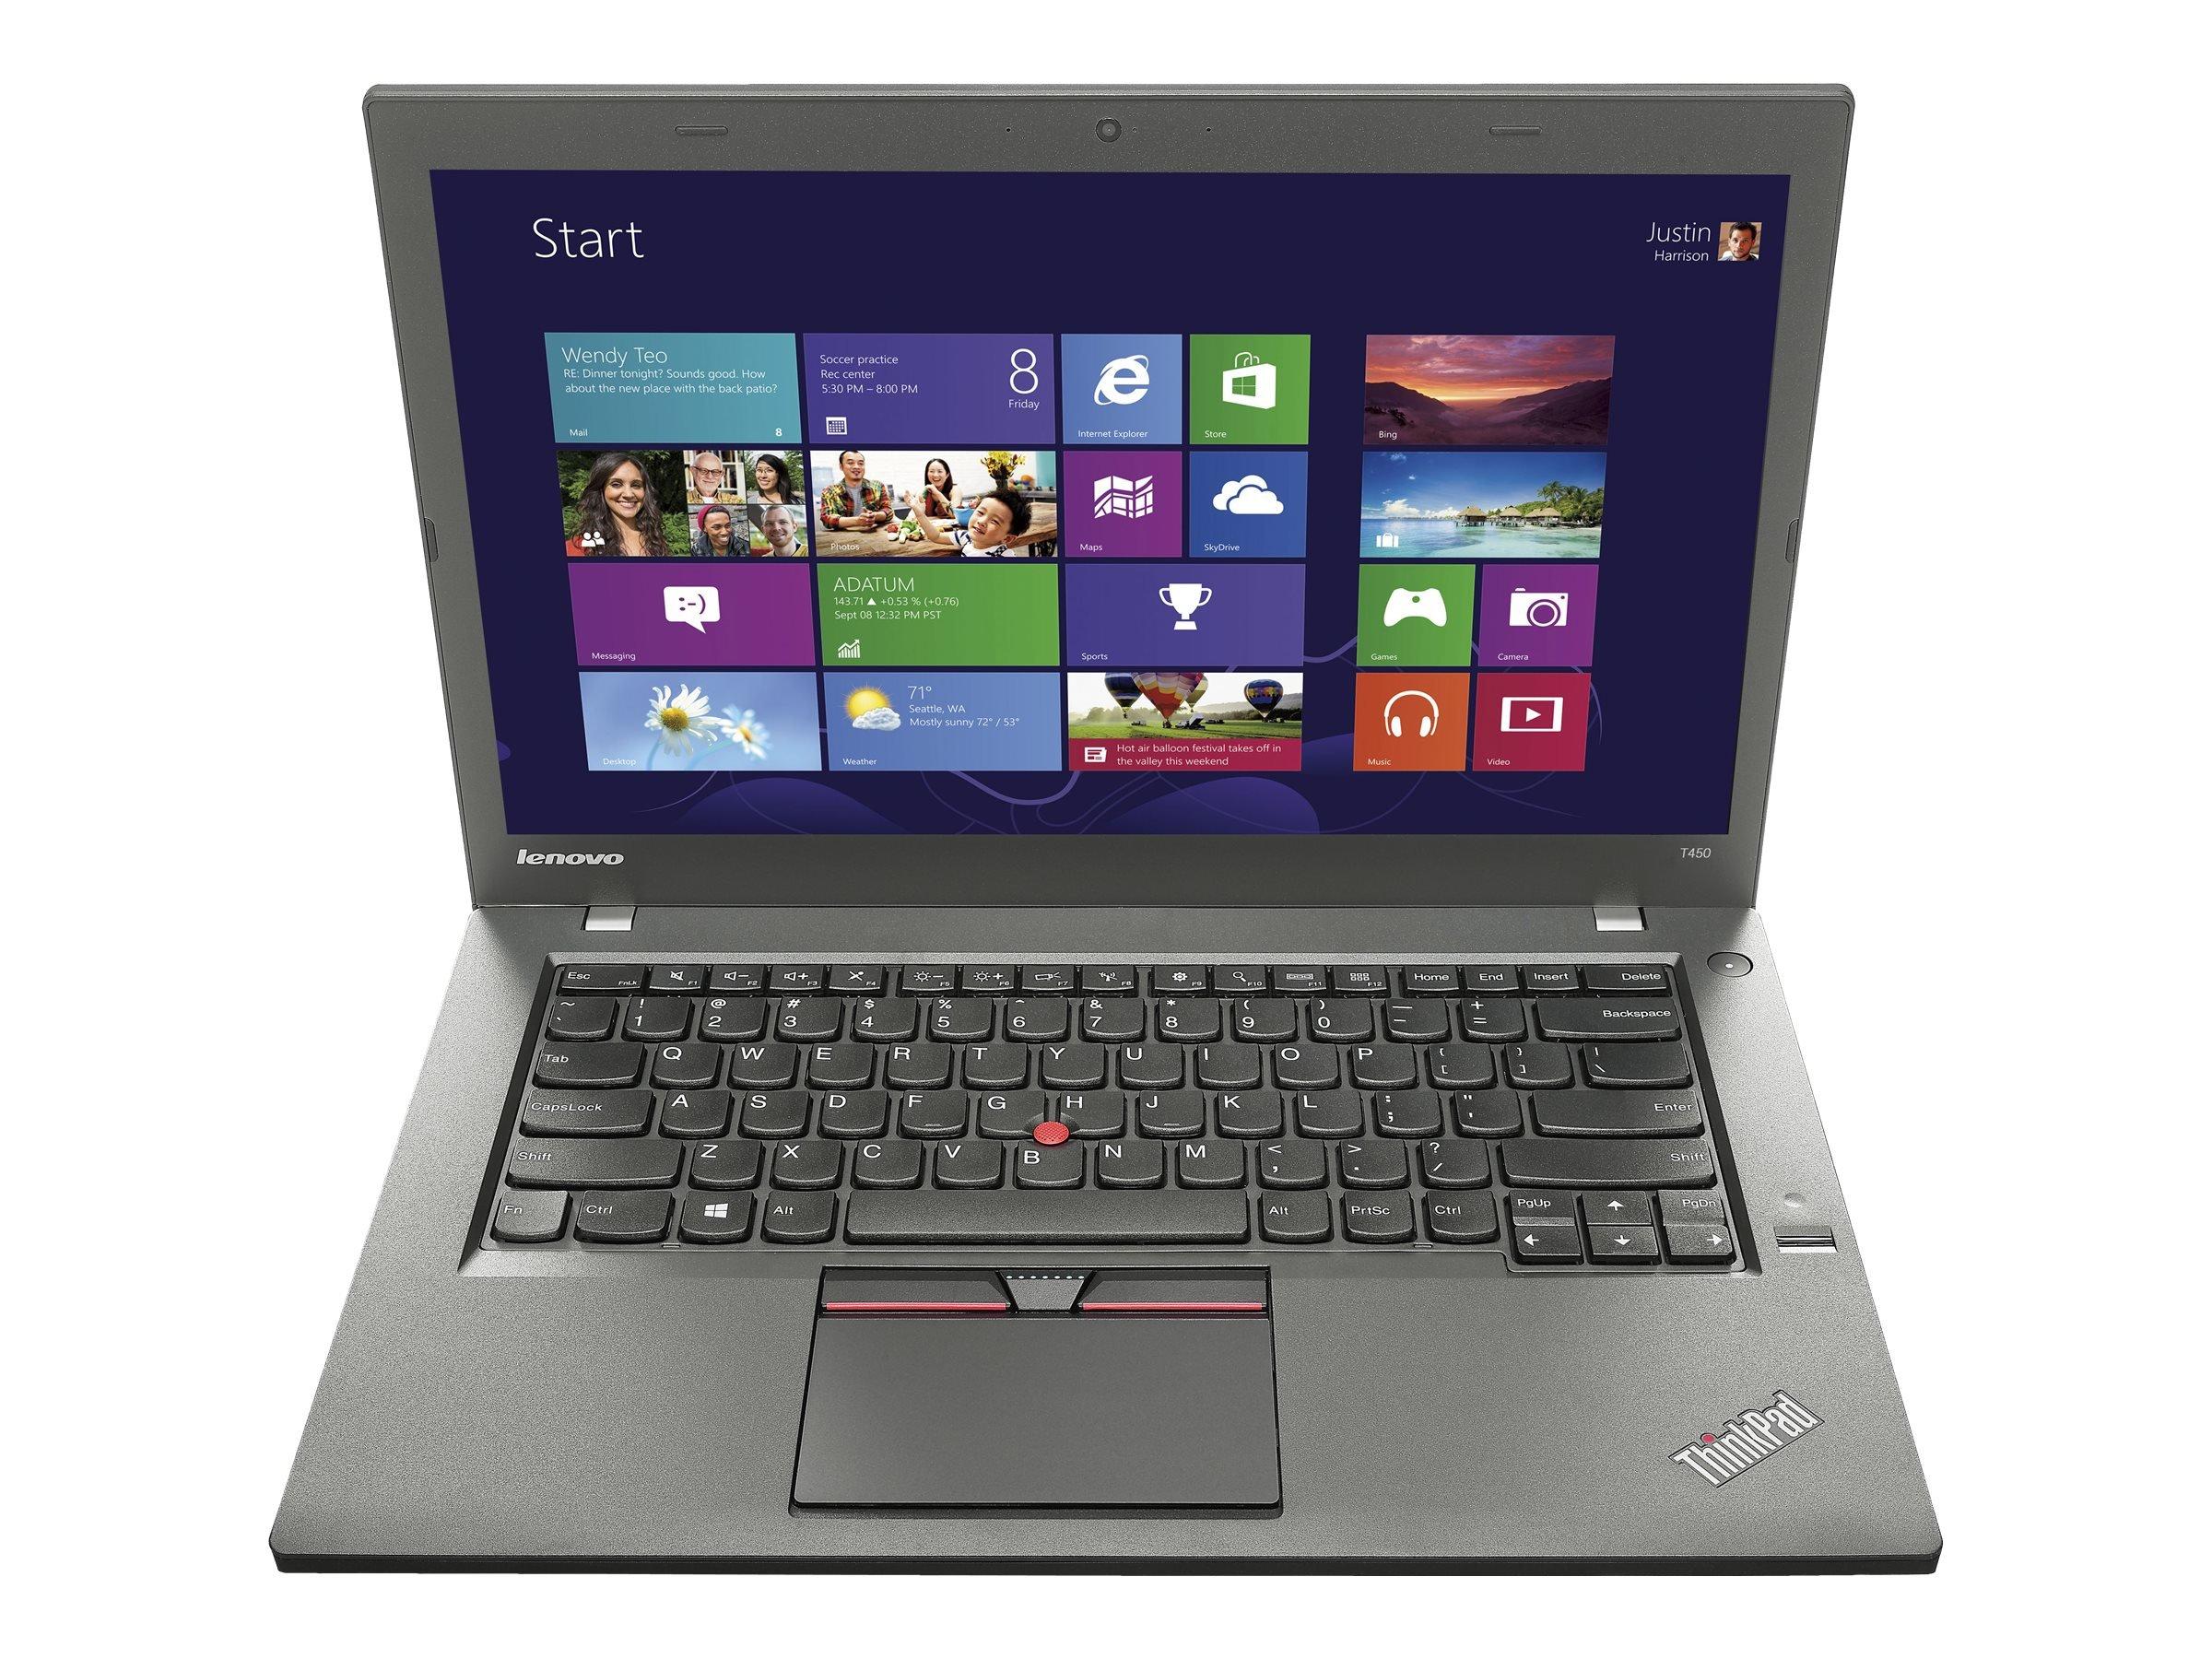 Lenovo Thinkpad T450 Laptop, I5-5300U, 2.3GHZ, 500GB SATA Drive, 8GB RAM, With Windows 10 Professional (Renewed)